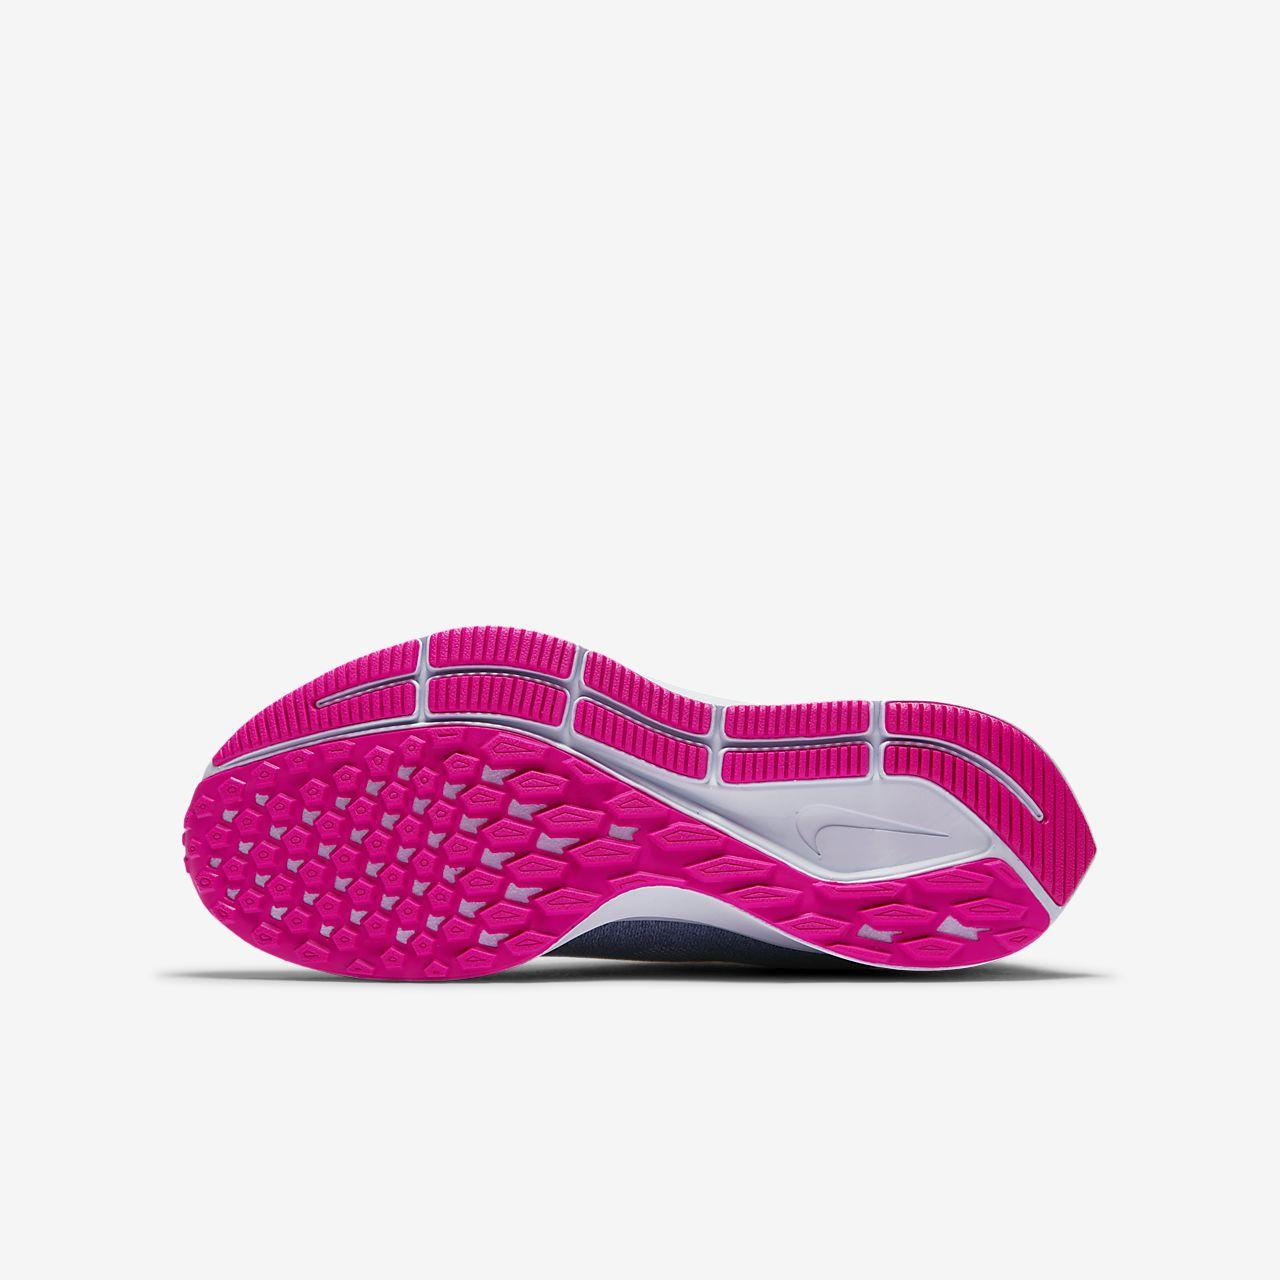 Nike Air Zoom Running Da Scarpa Pegasus 35 Shield Bambiniragazzi Rj4L35Aq